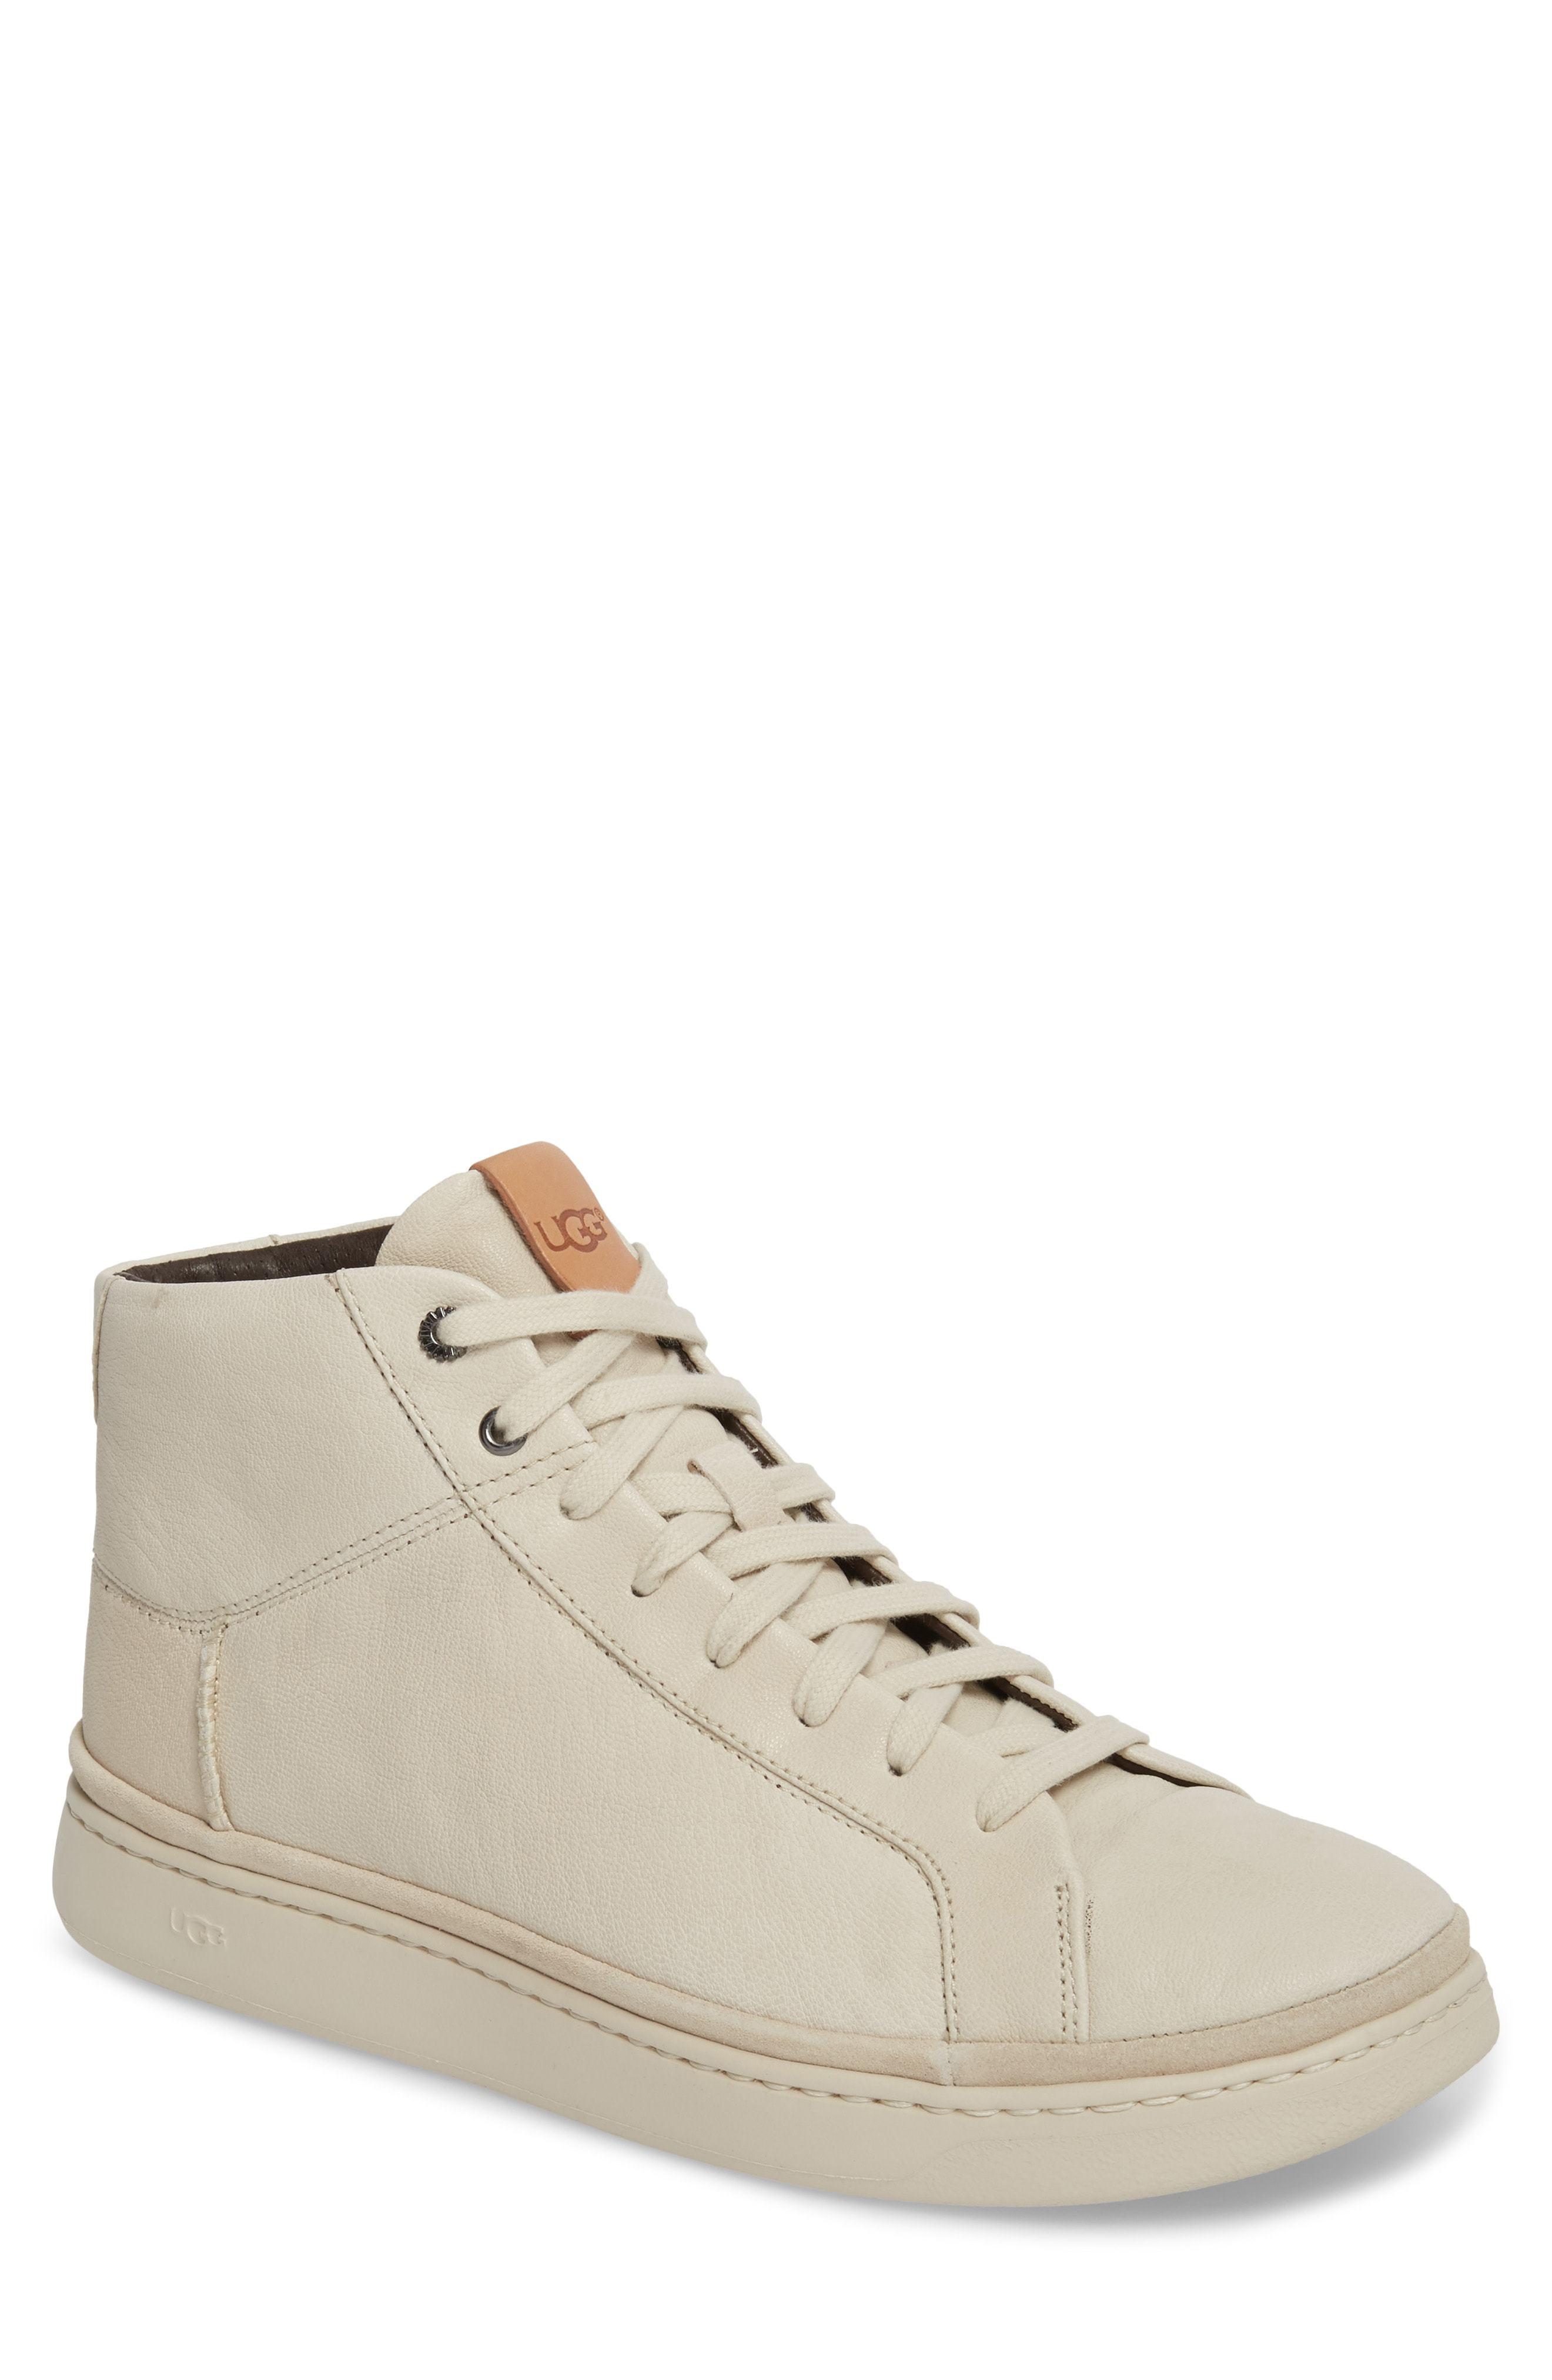 UGG Cali High Top Sneaker, $90